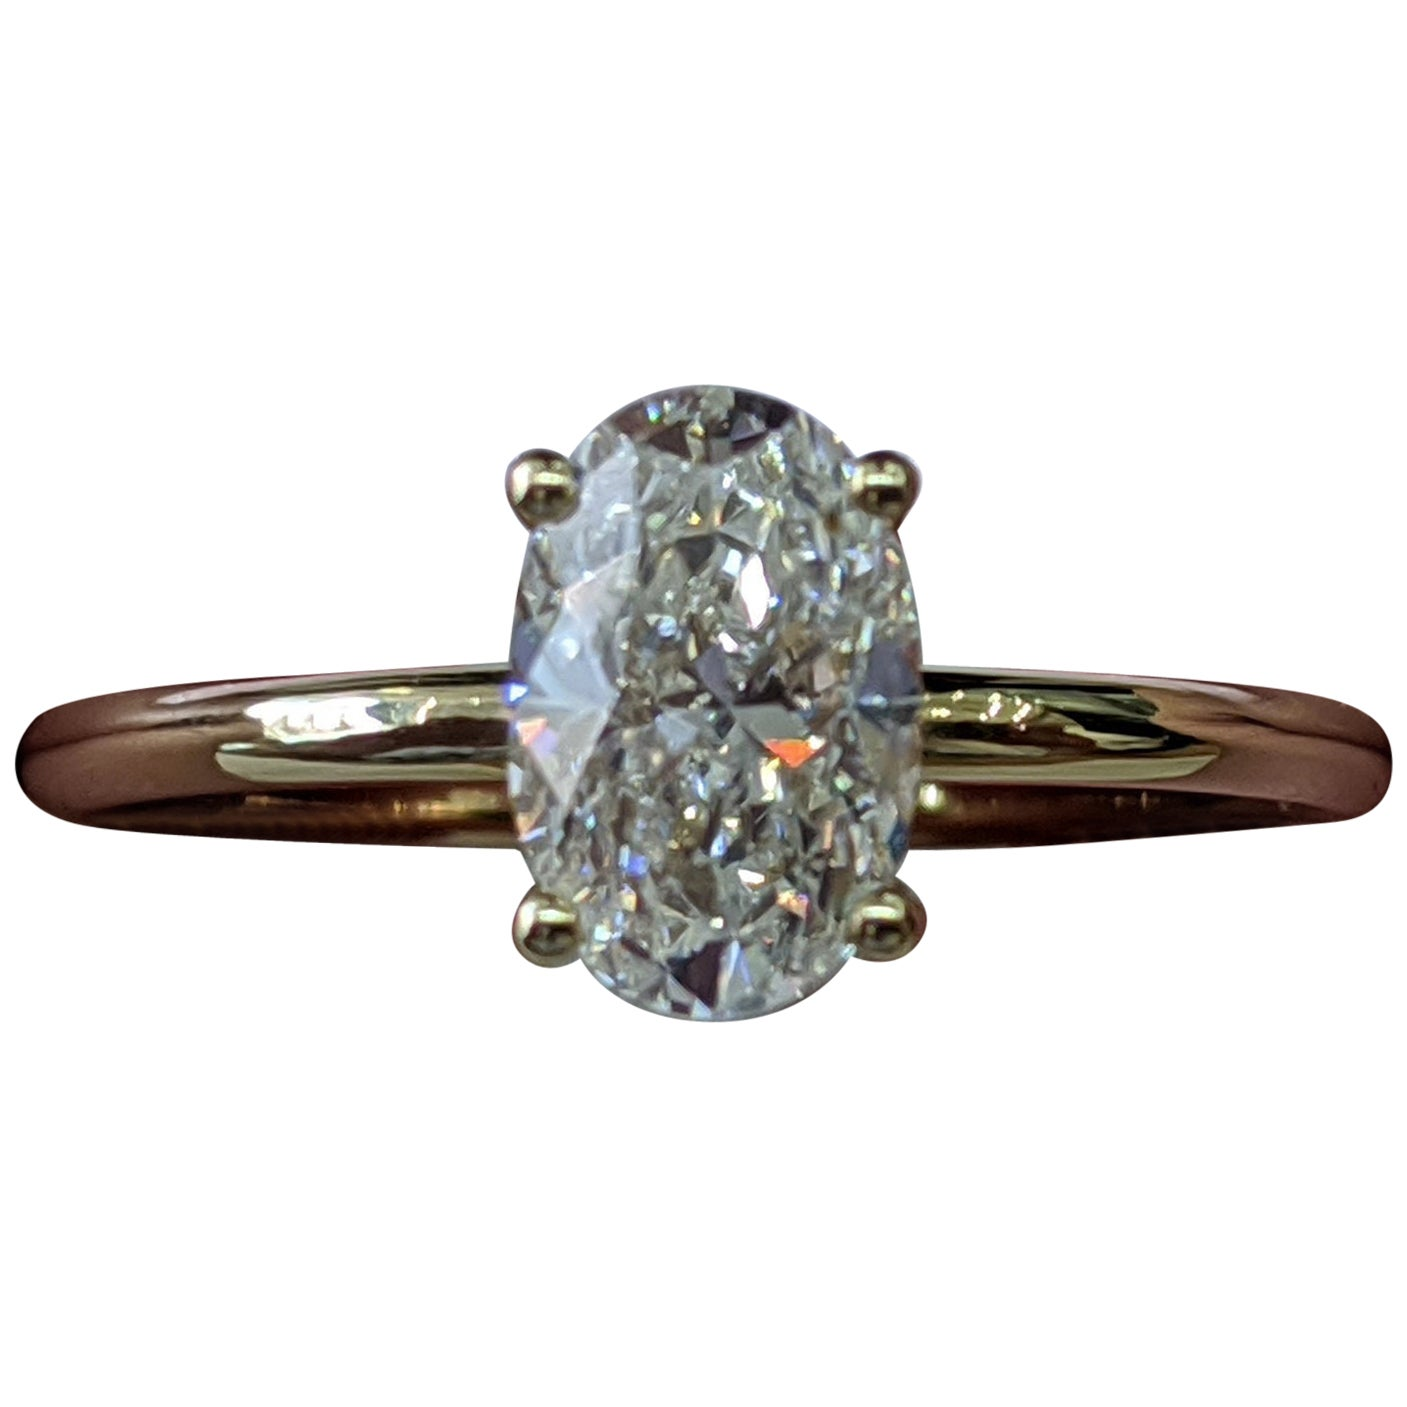 1 Carat 14 Karat Yellow Gold Oval Diamond Engagement Ring